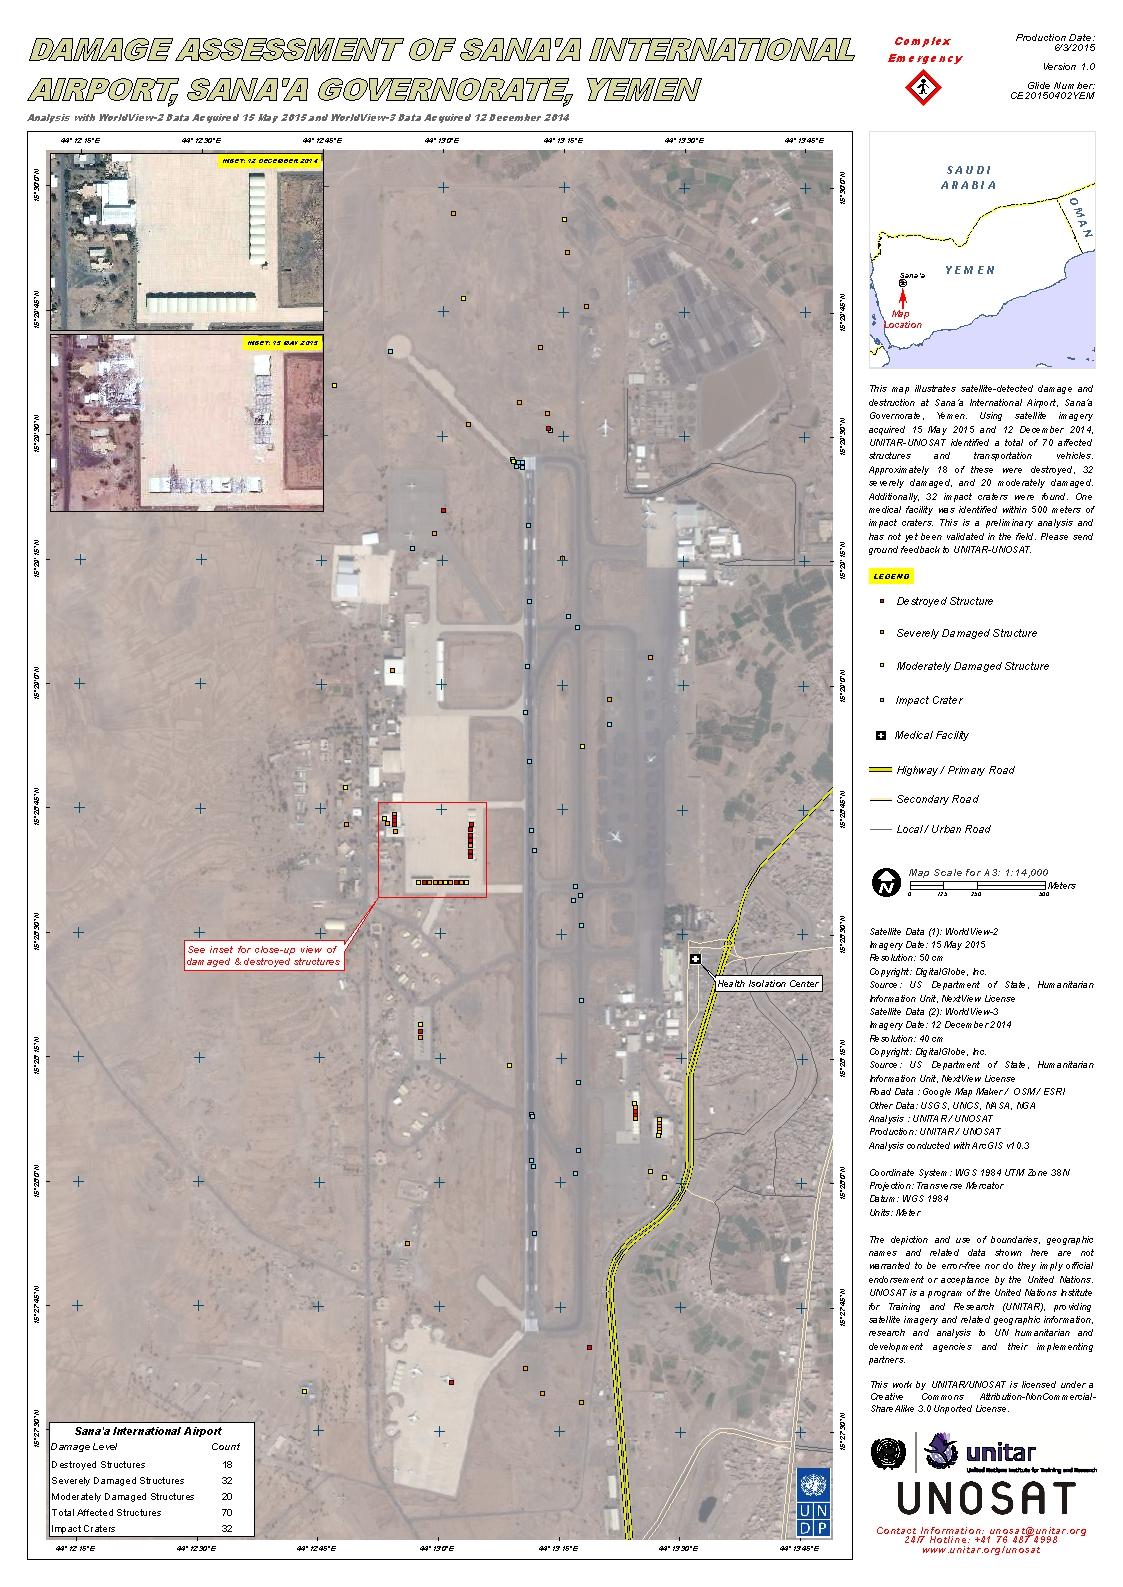 Damage Assessment of Sanaa International Airport Sanaa